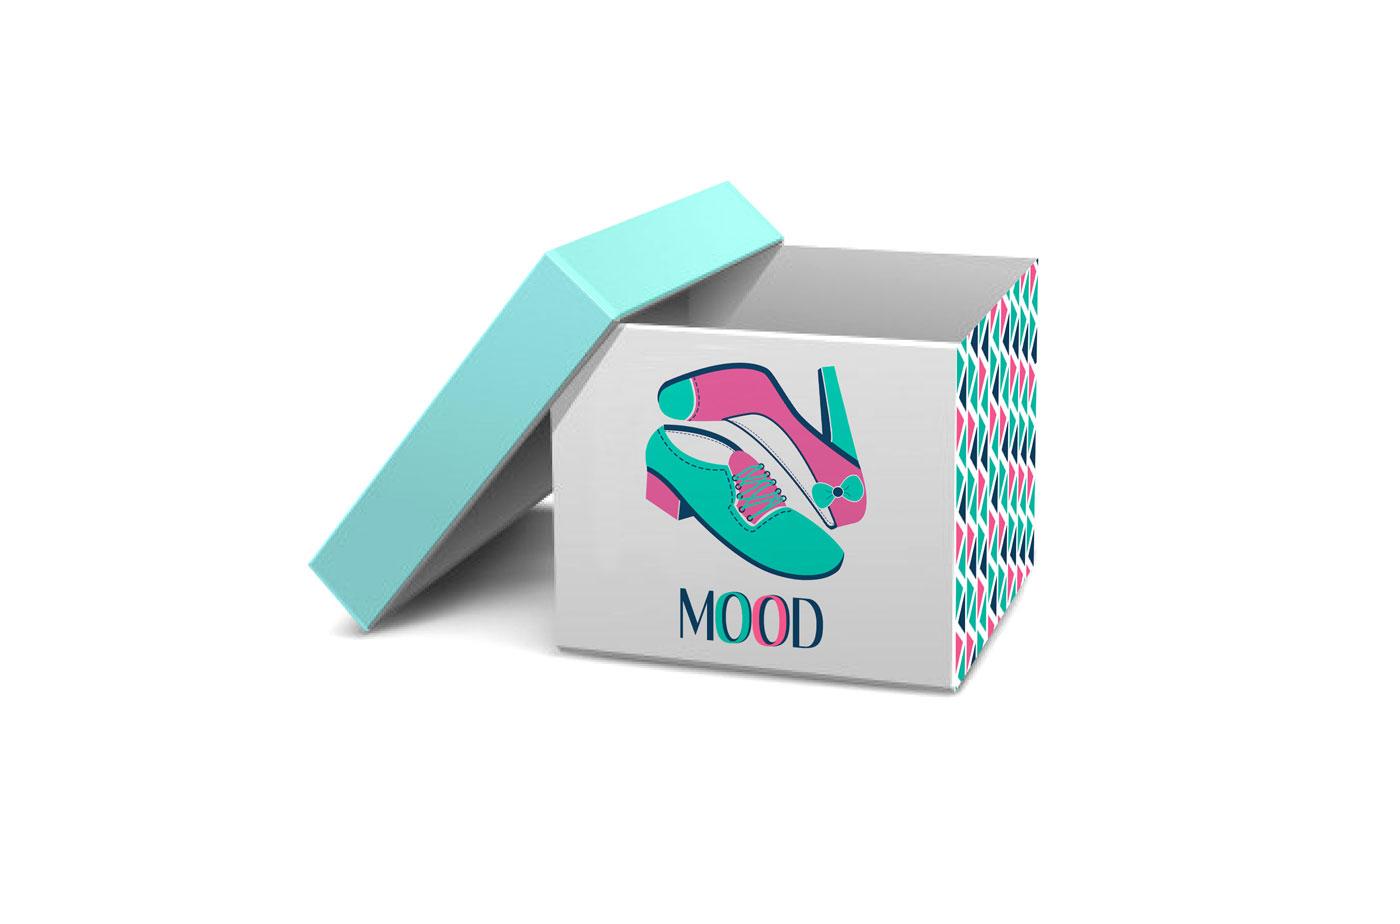 Mood7